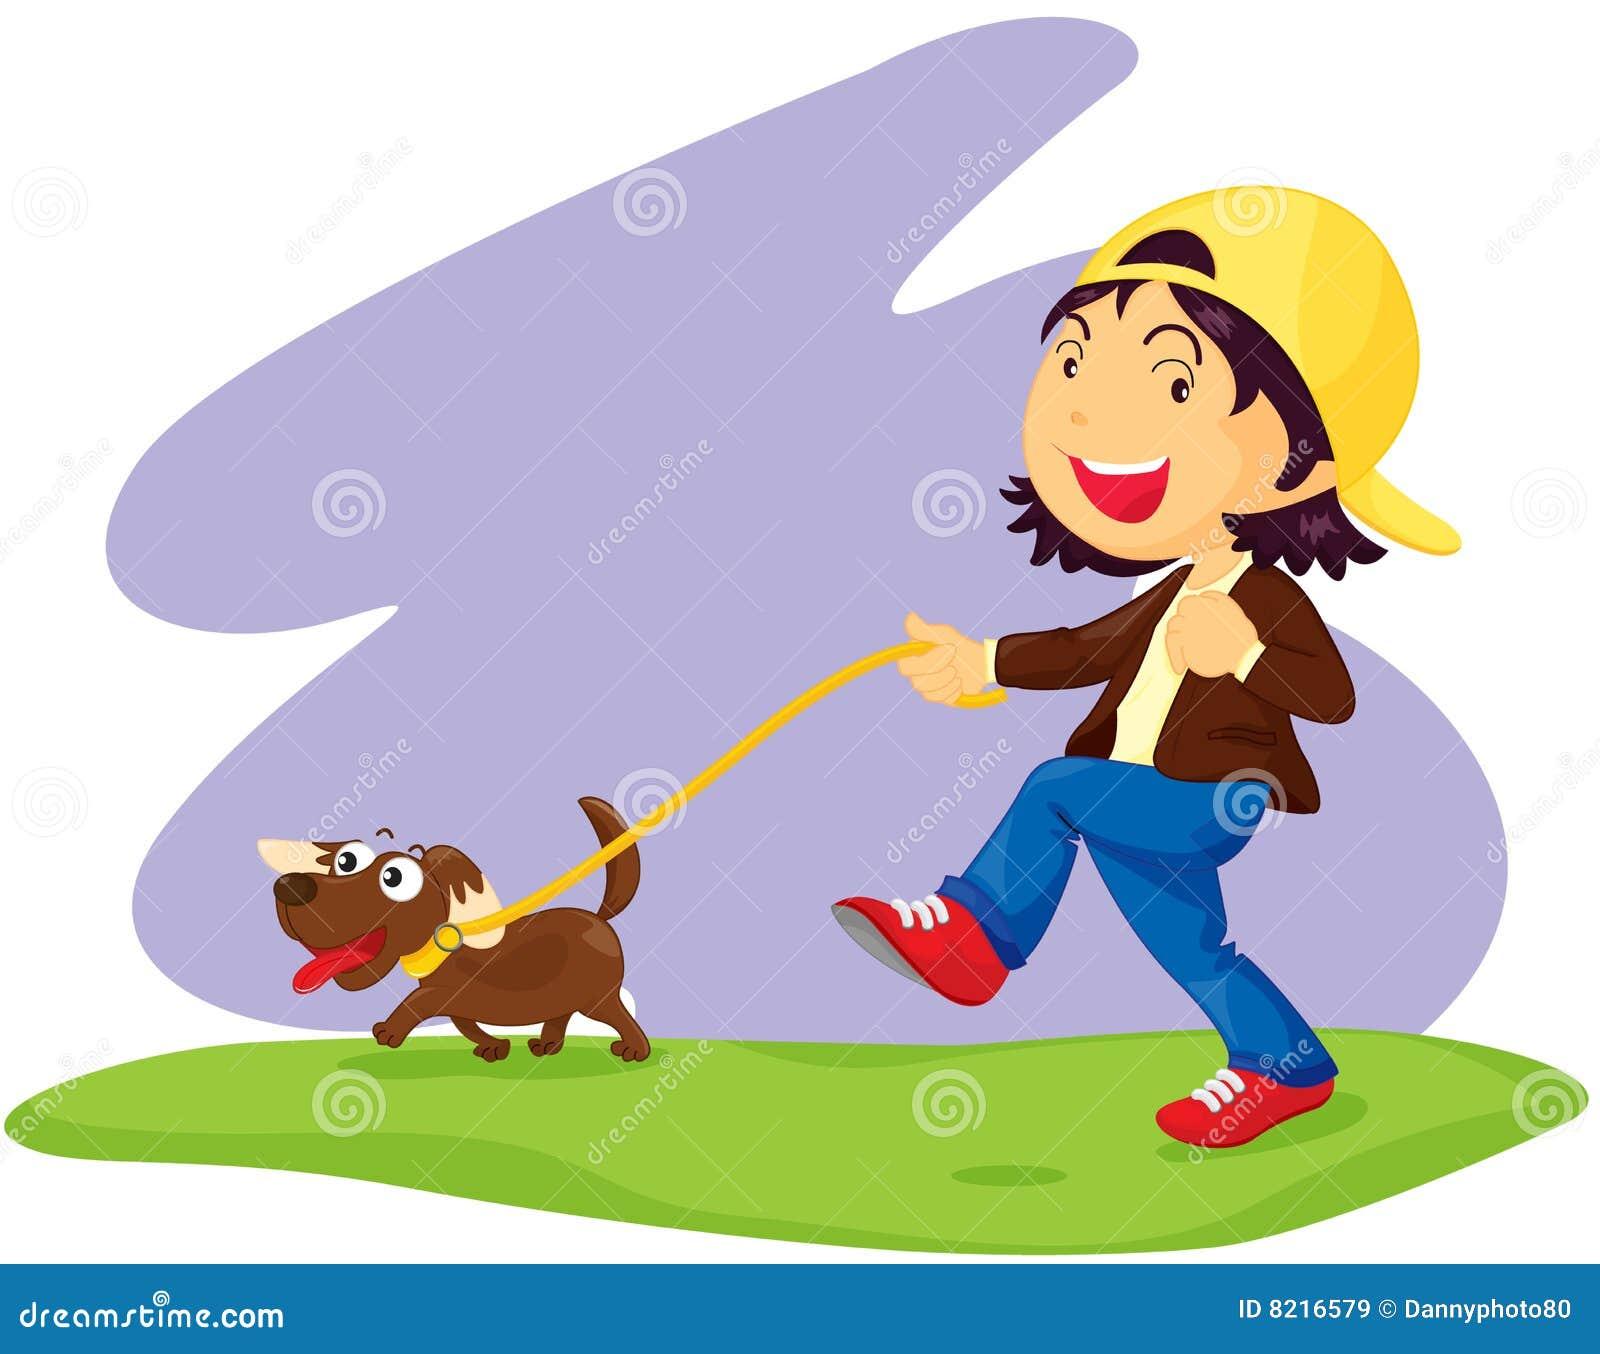 clipart girl walking dog - photo #33